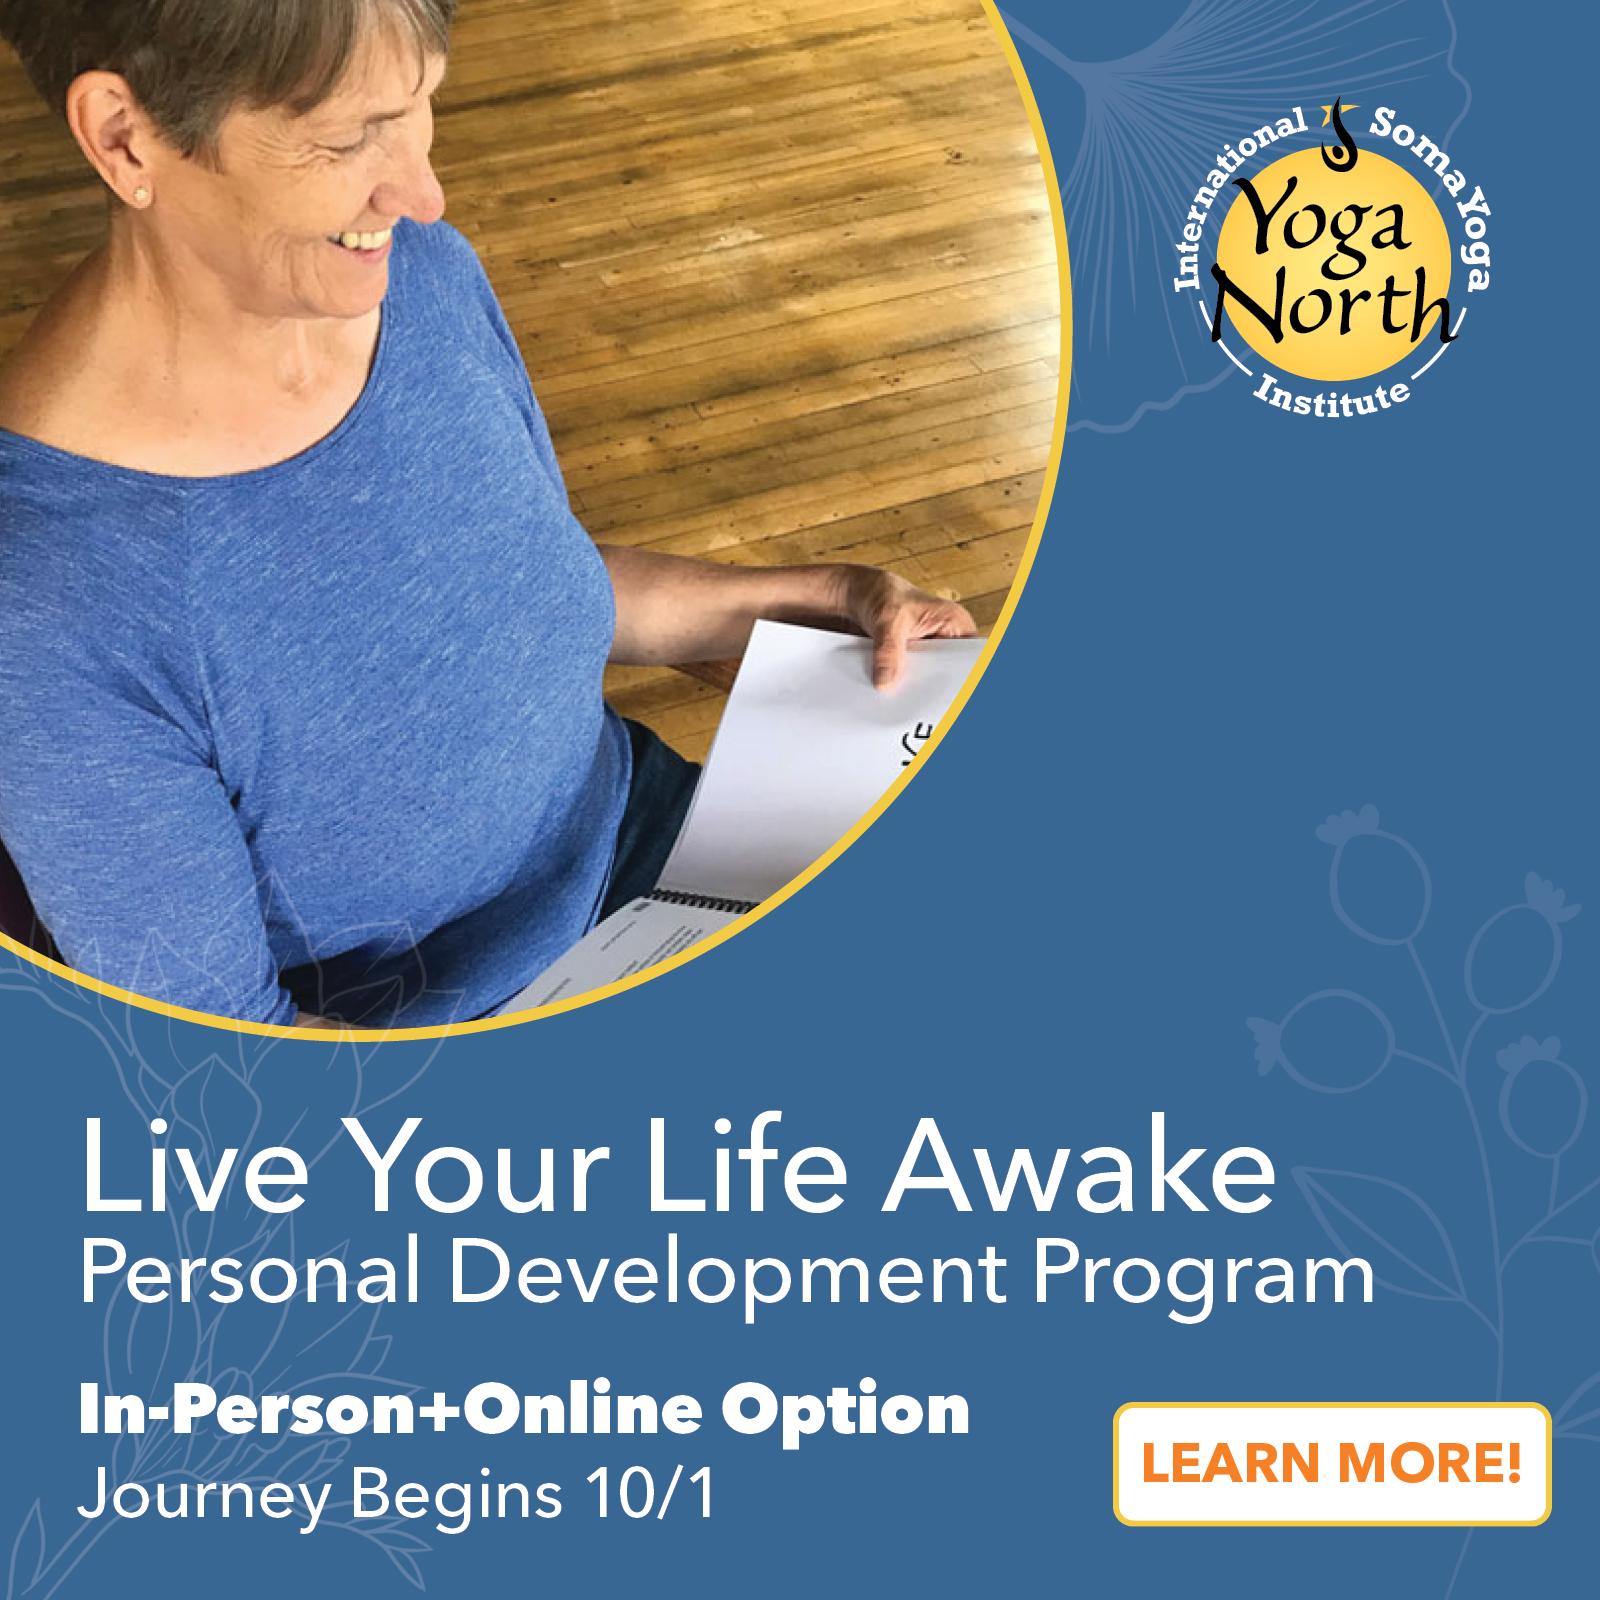 Yoga North ISYI Live Your Life Awake Path